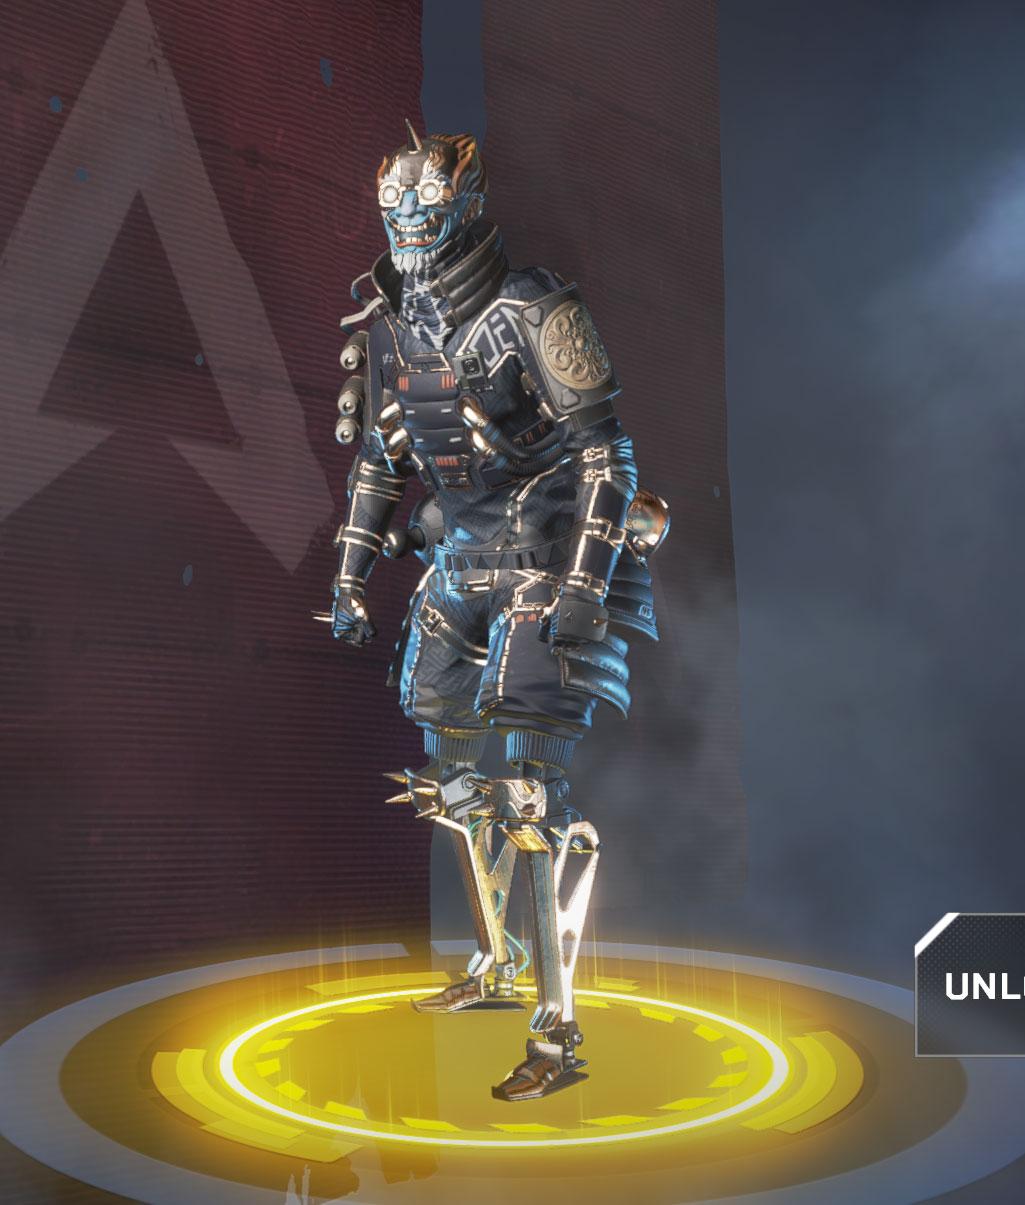 Apex Legends Octane Guide – Abilities, Tips & Skins! – Pro